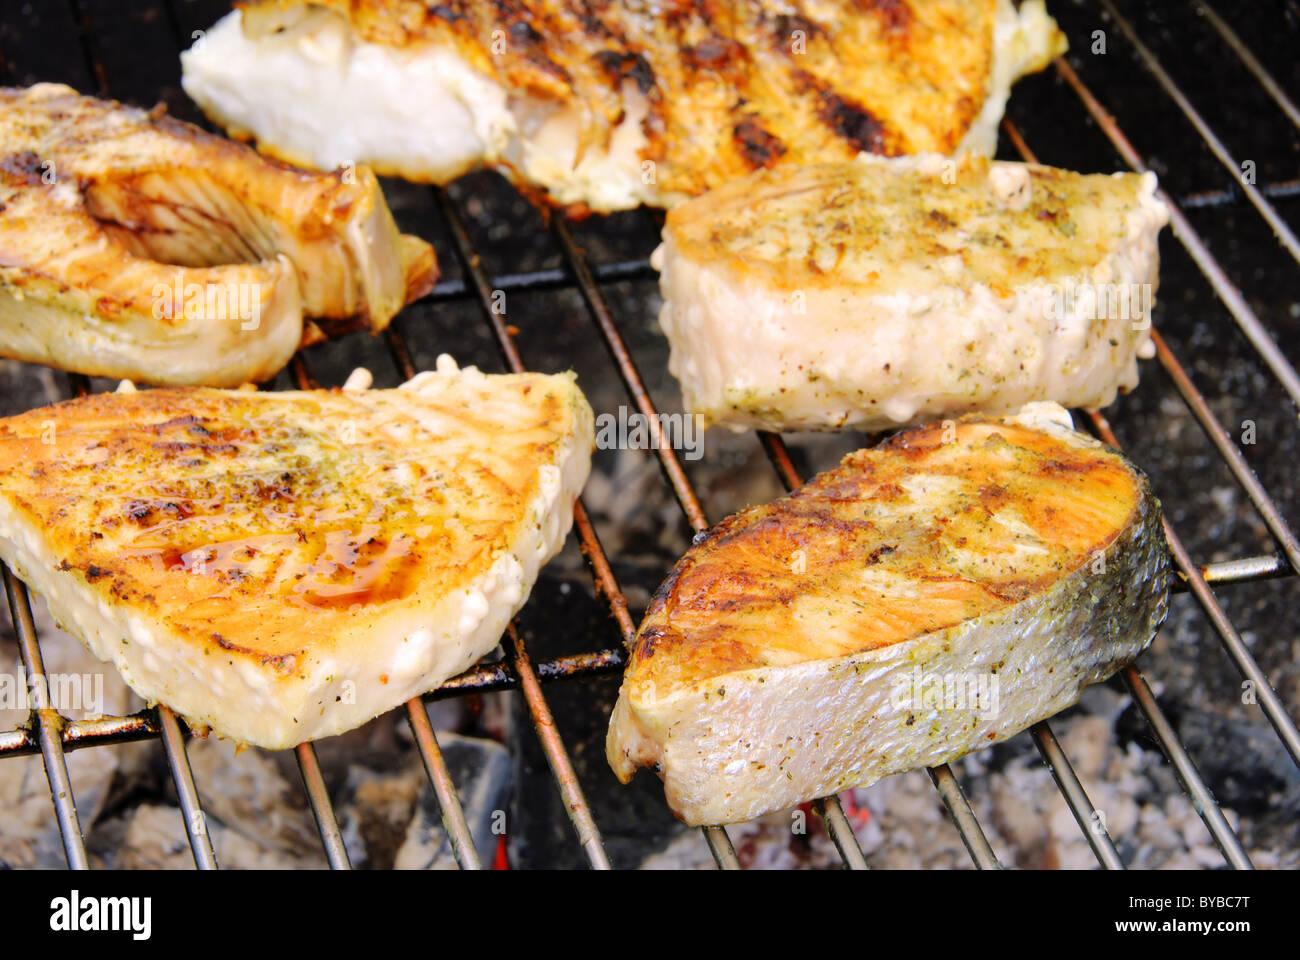 Grillen Fischsteak - grilling steak from fish 11 - Stock Image